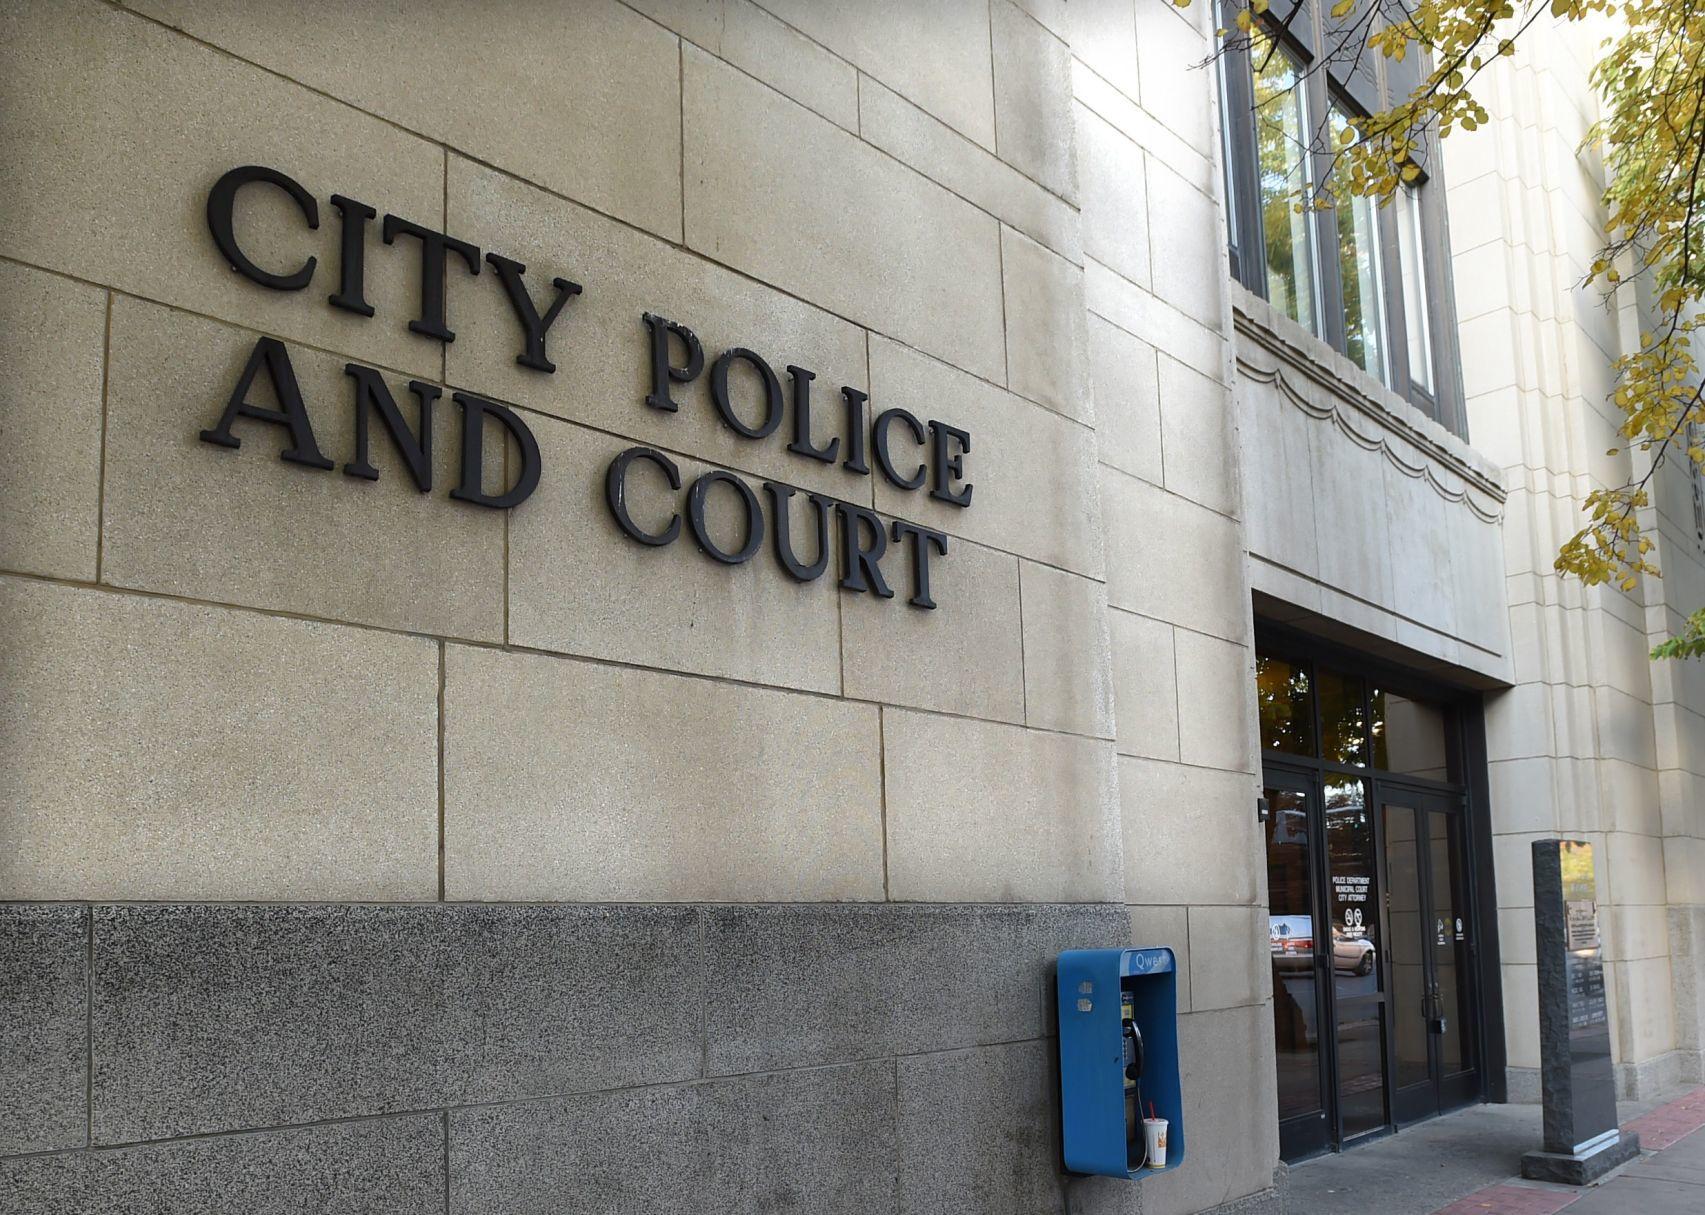 Billings cops disciplined for on-the-job sex file lawsuit to have investigation records sealed | Billings Gazette